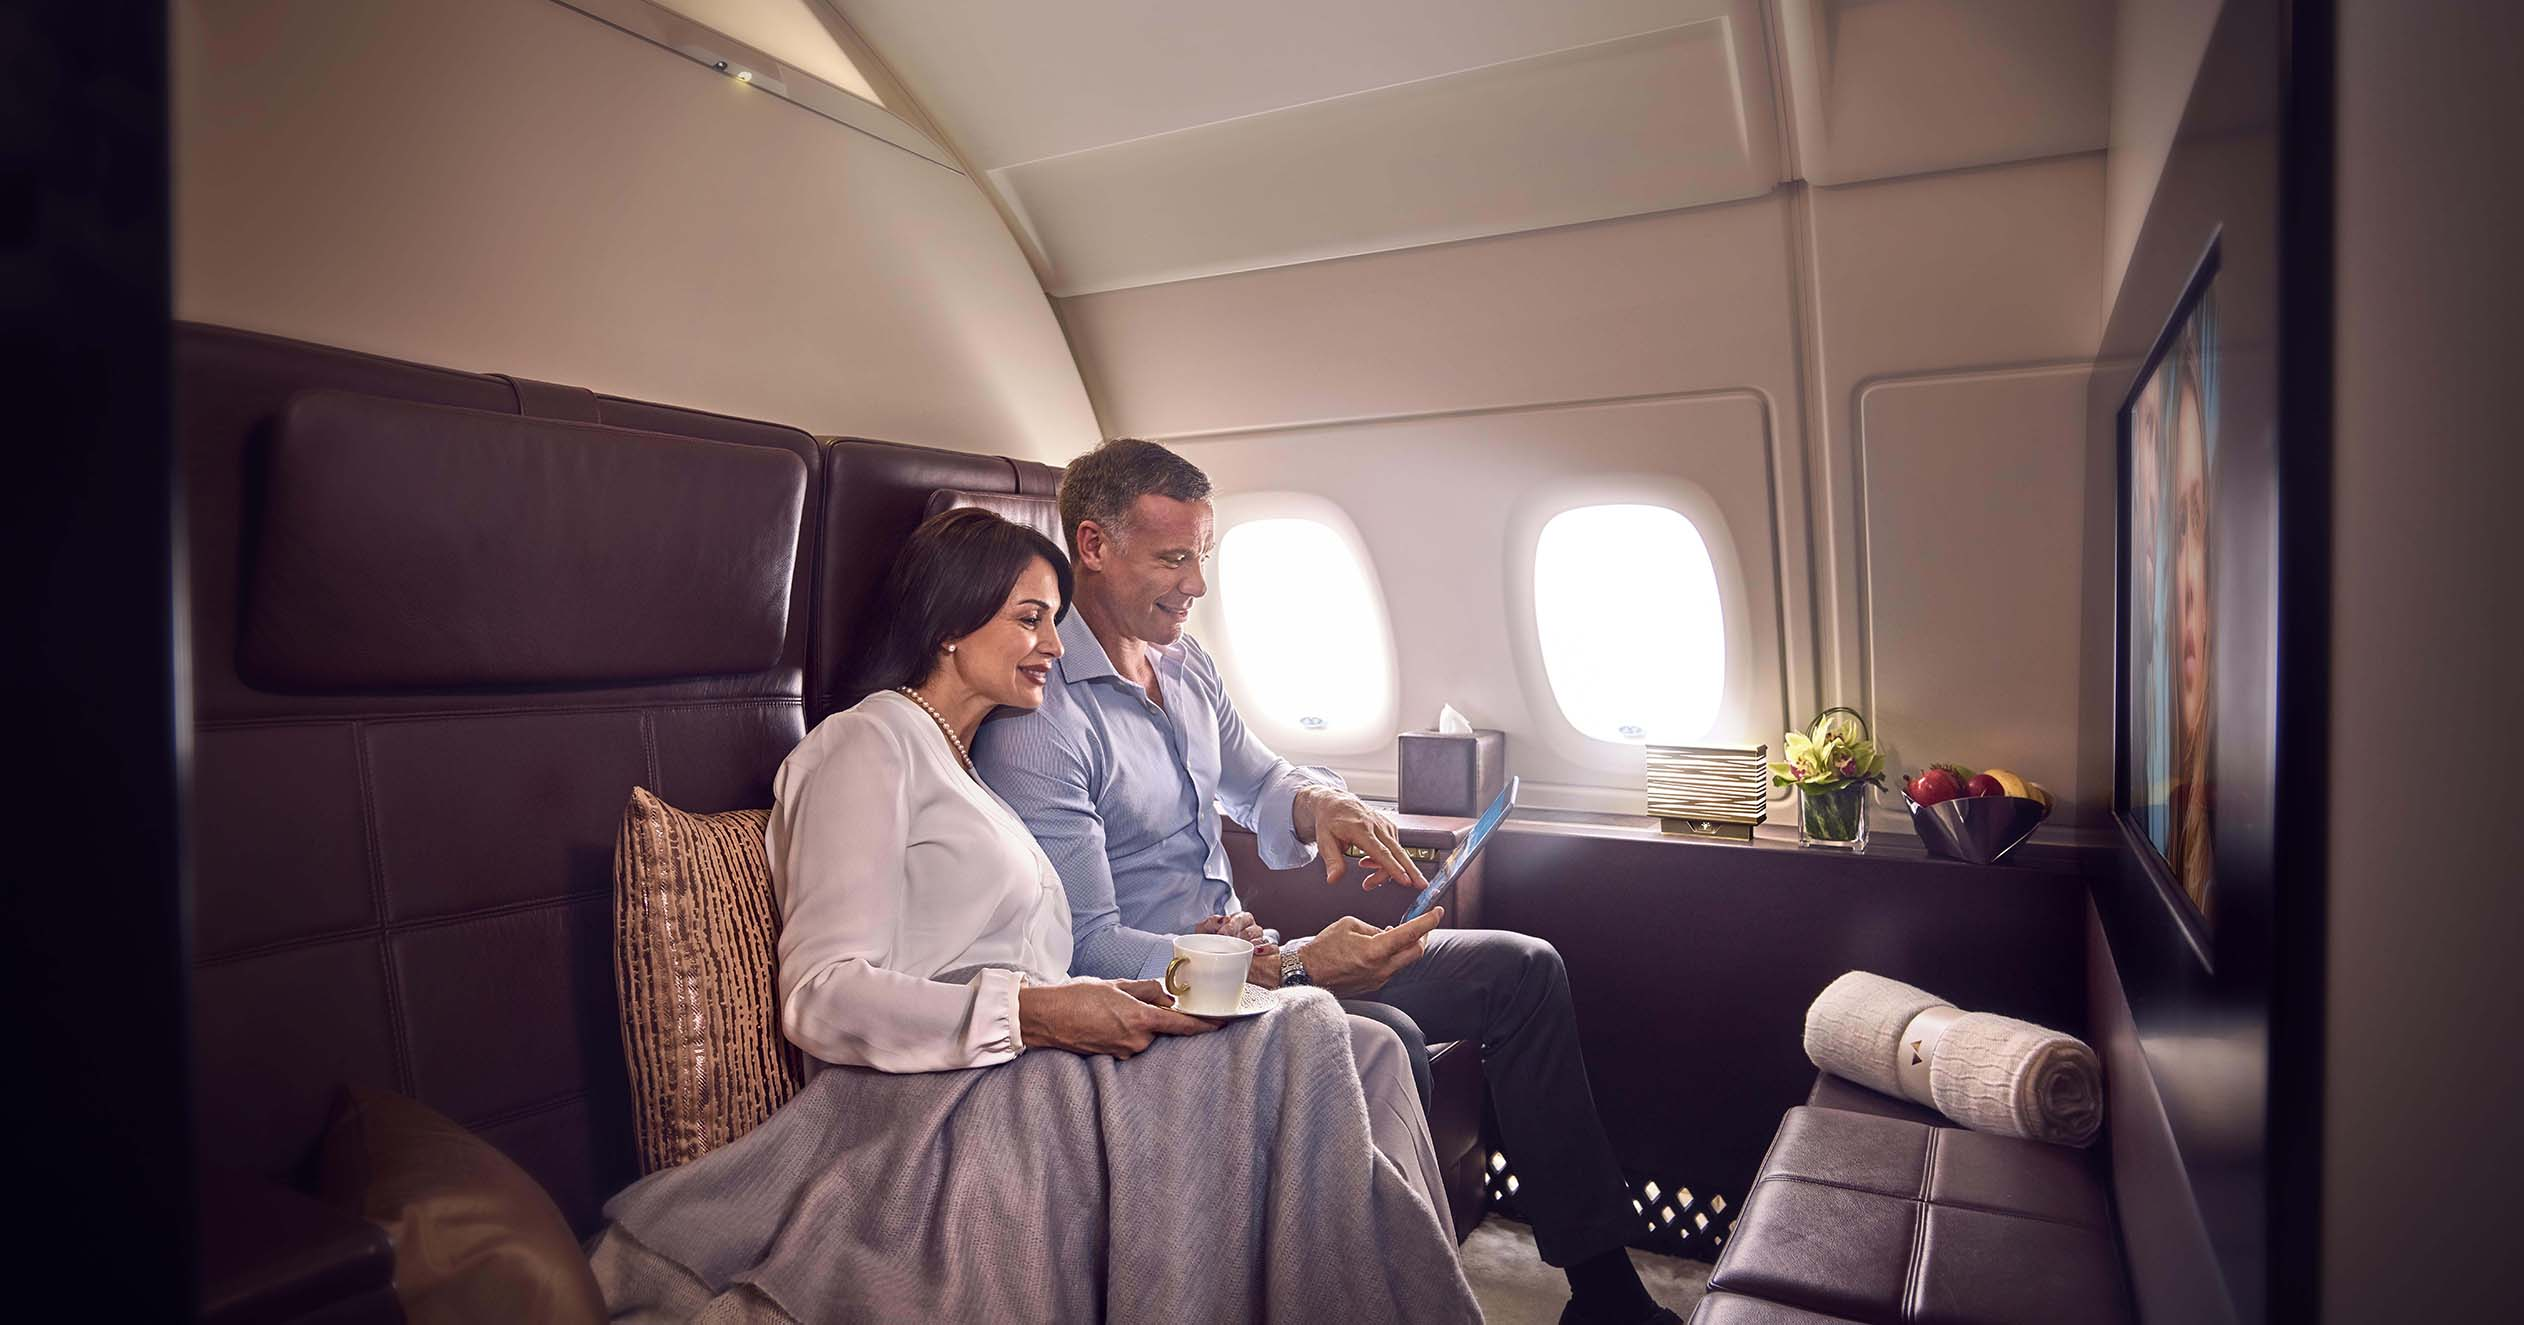 How to Maximize the New Etihad andAir Canada Partnership